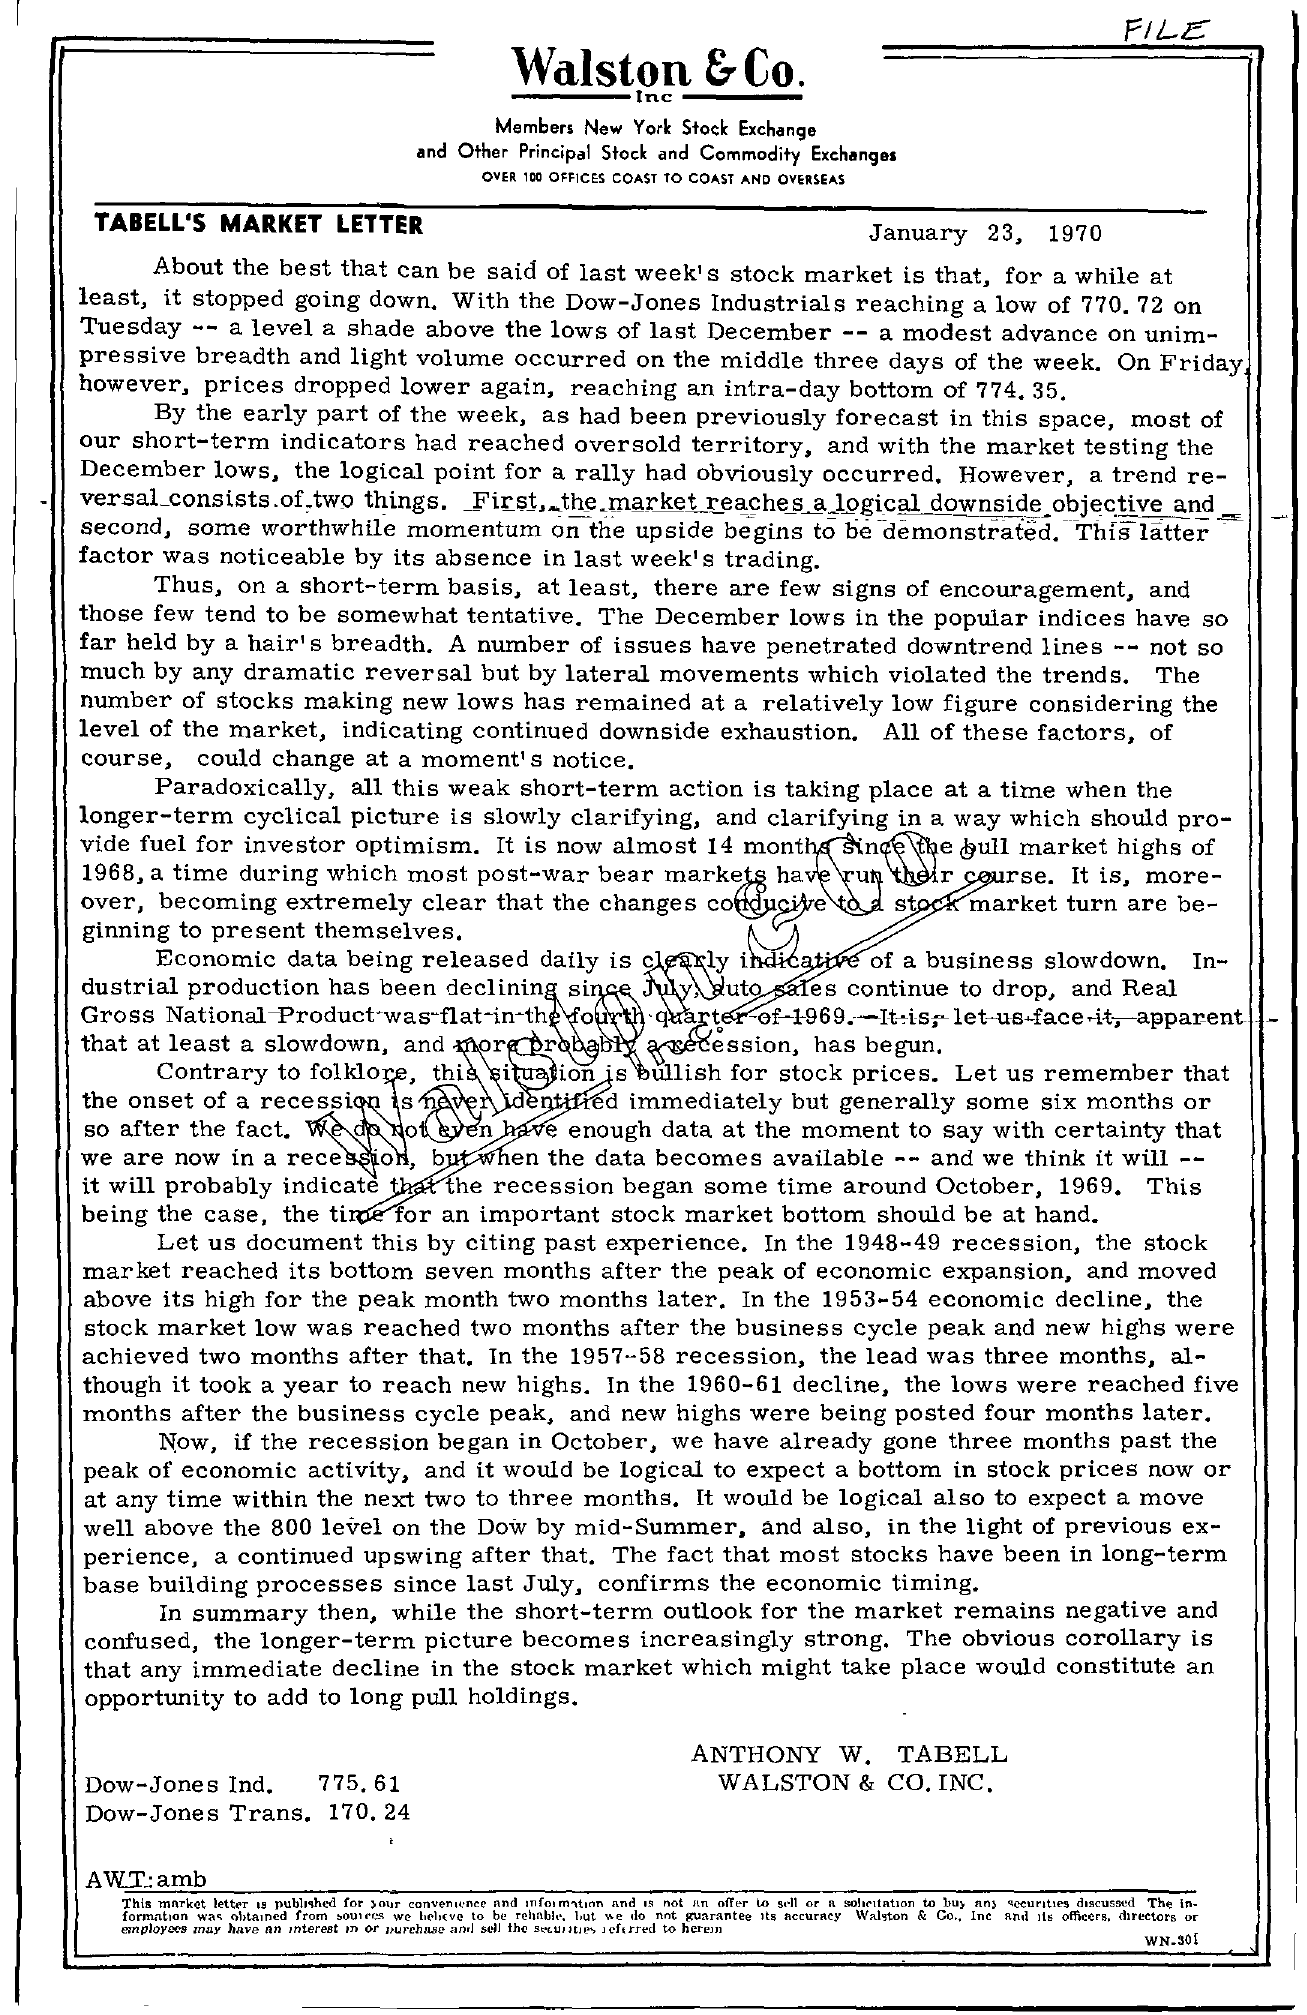 Tabell's Market Letter - January 23, 1970